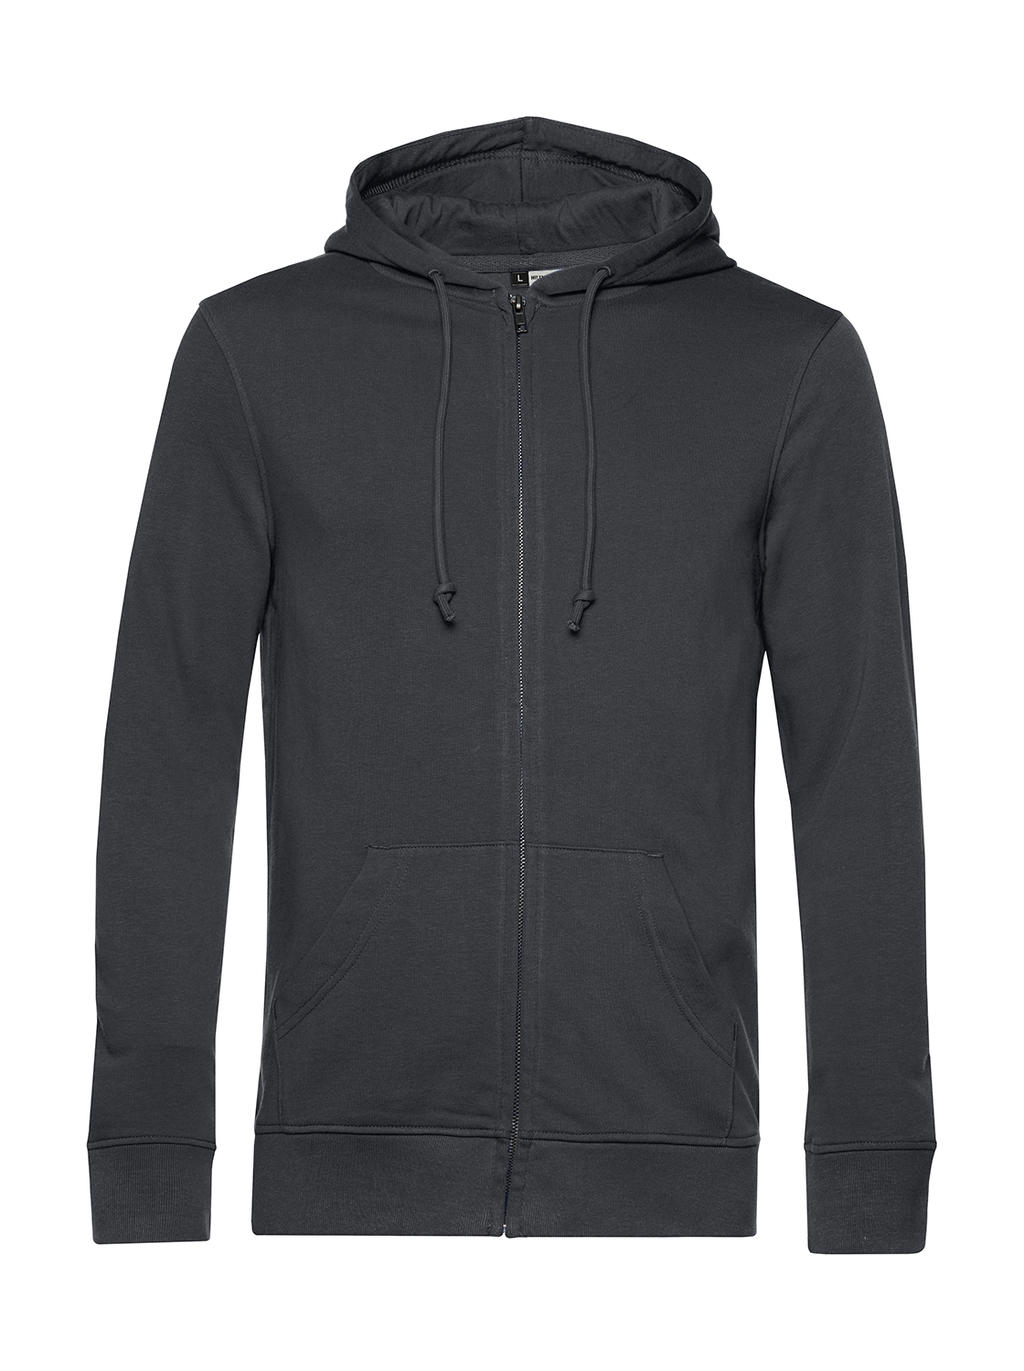 Organic Zipped Hooded - zvìtšit obrázek